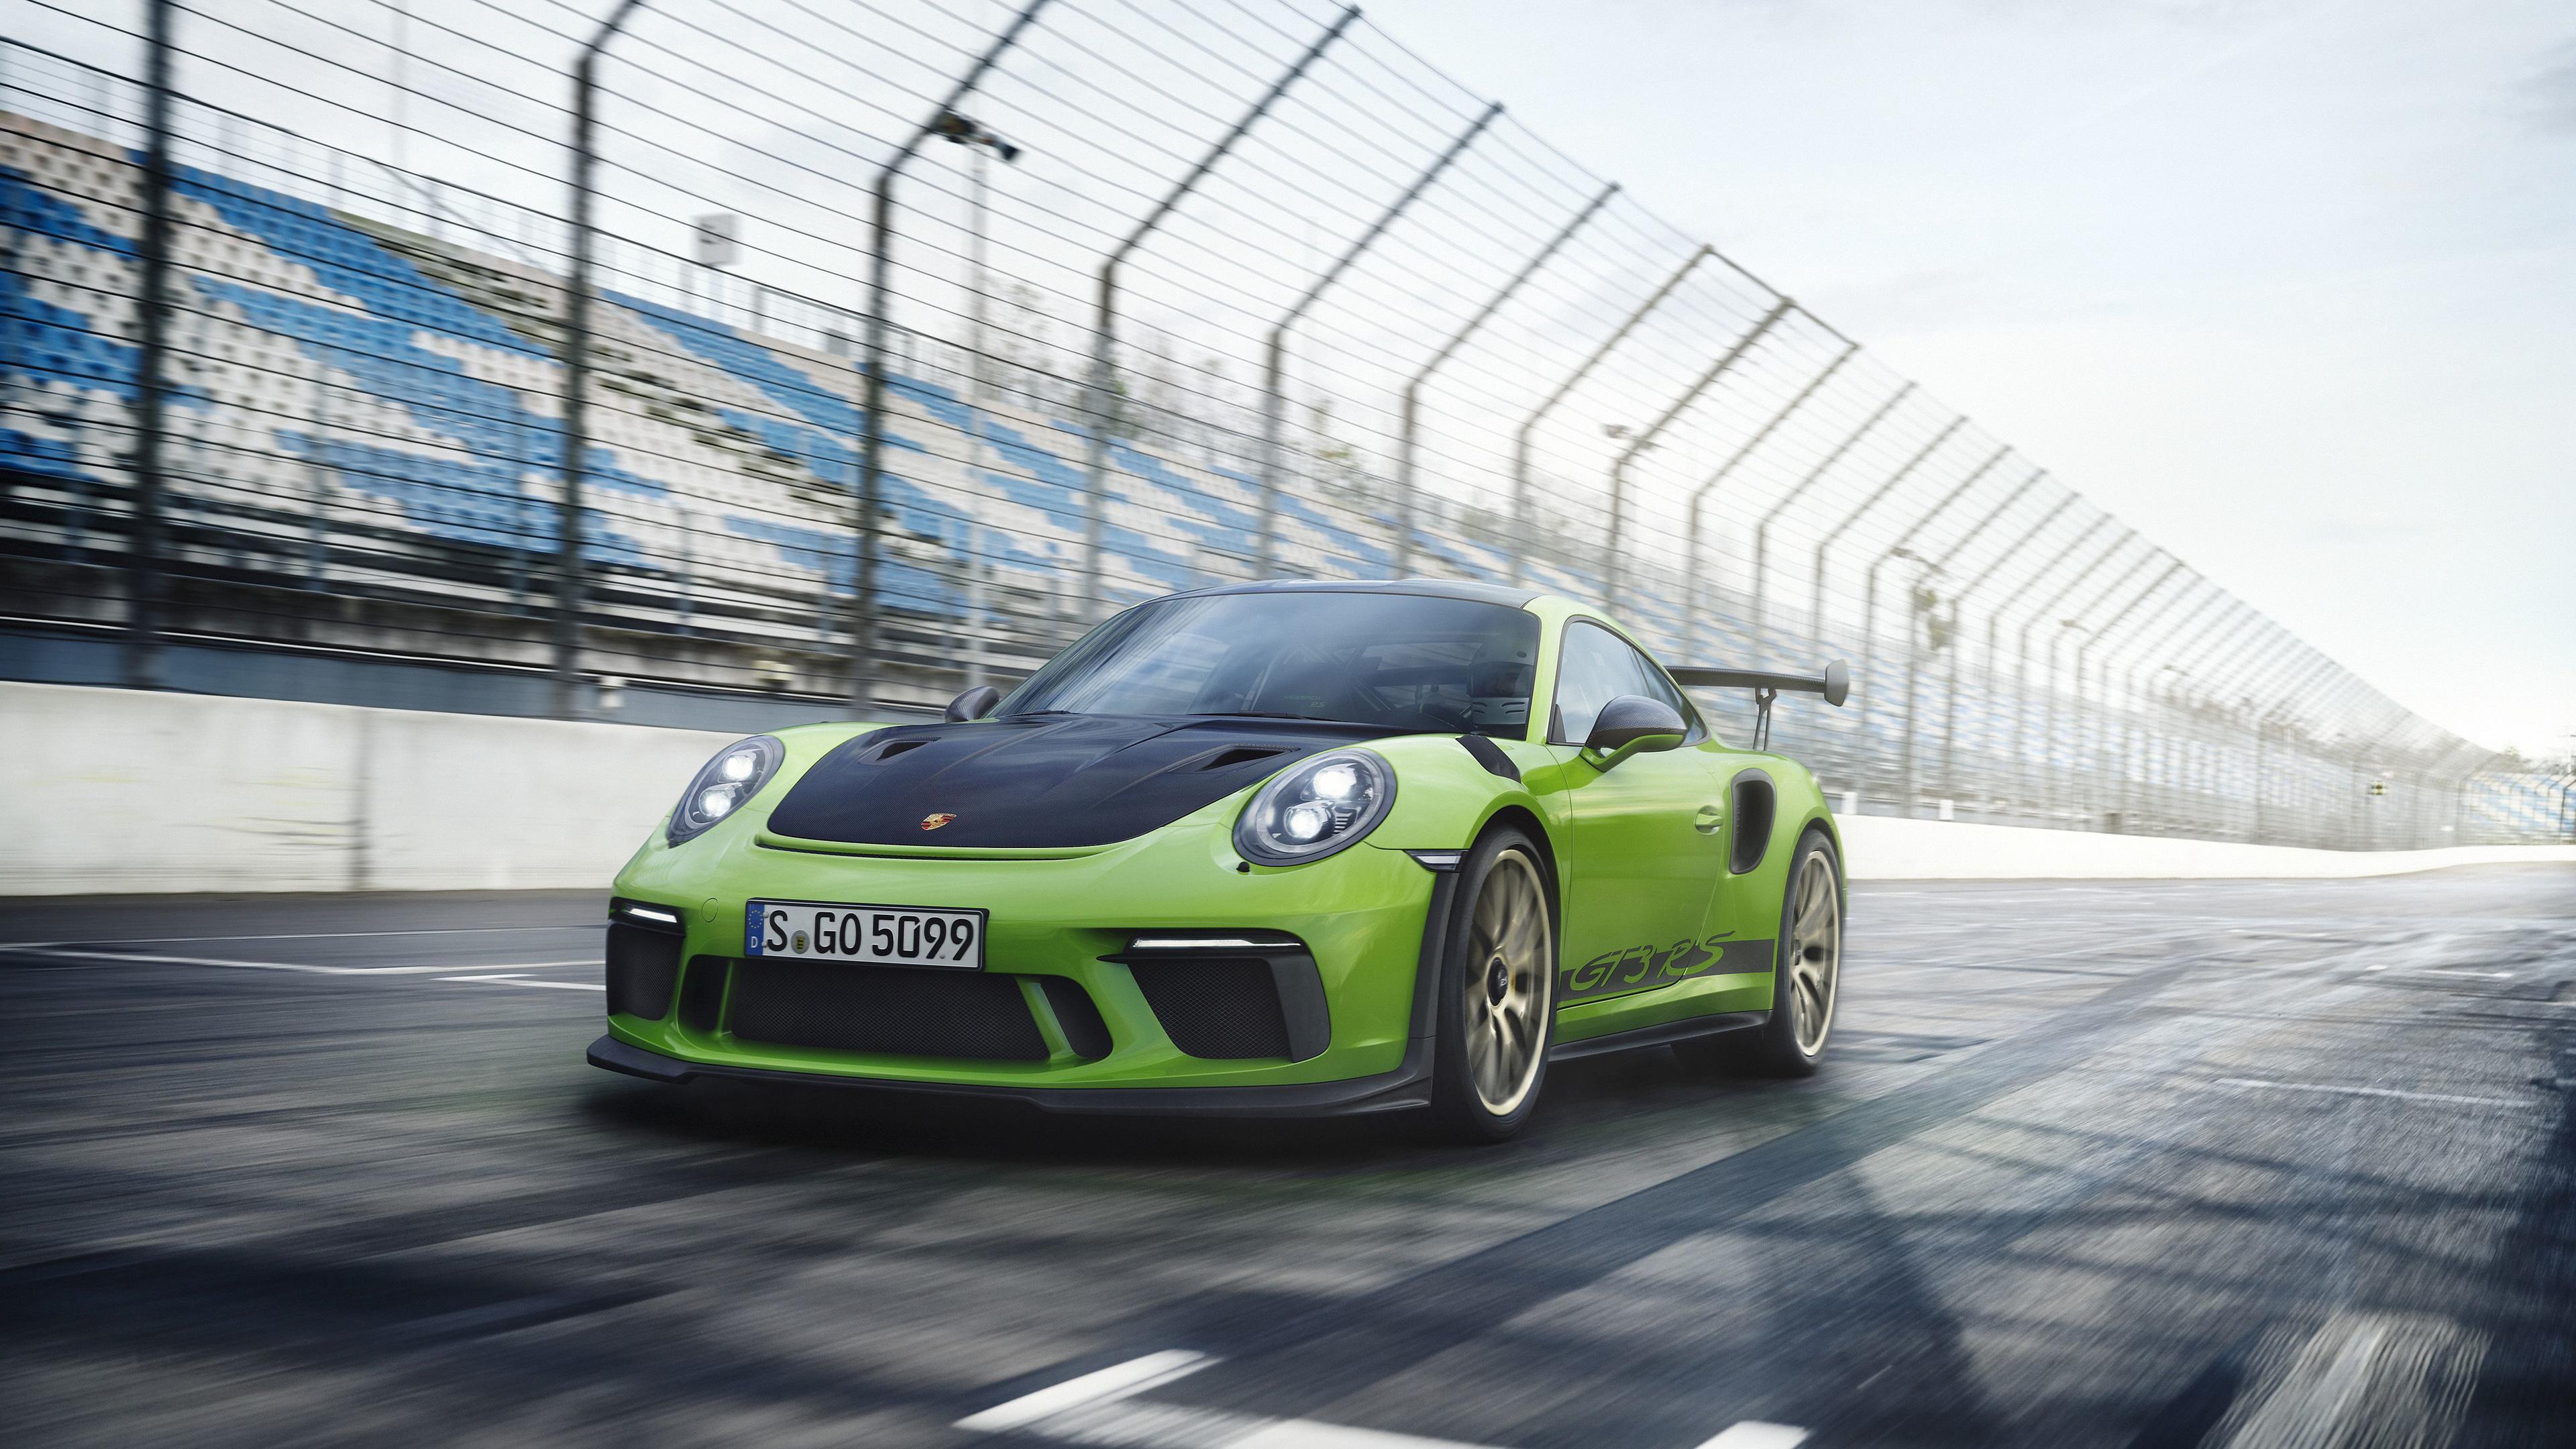 porsche 911 gt3 rs 2018 1539109933 - Porsche 911 GT3 RS 2018 - porsche wallpapers, porsche 911 wallpapers, hd-wallpapers, cars wallpapers, 4k-wallpapers, 2018 cars wallpapers